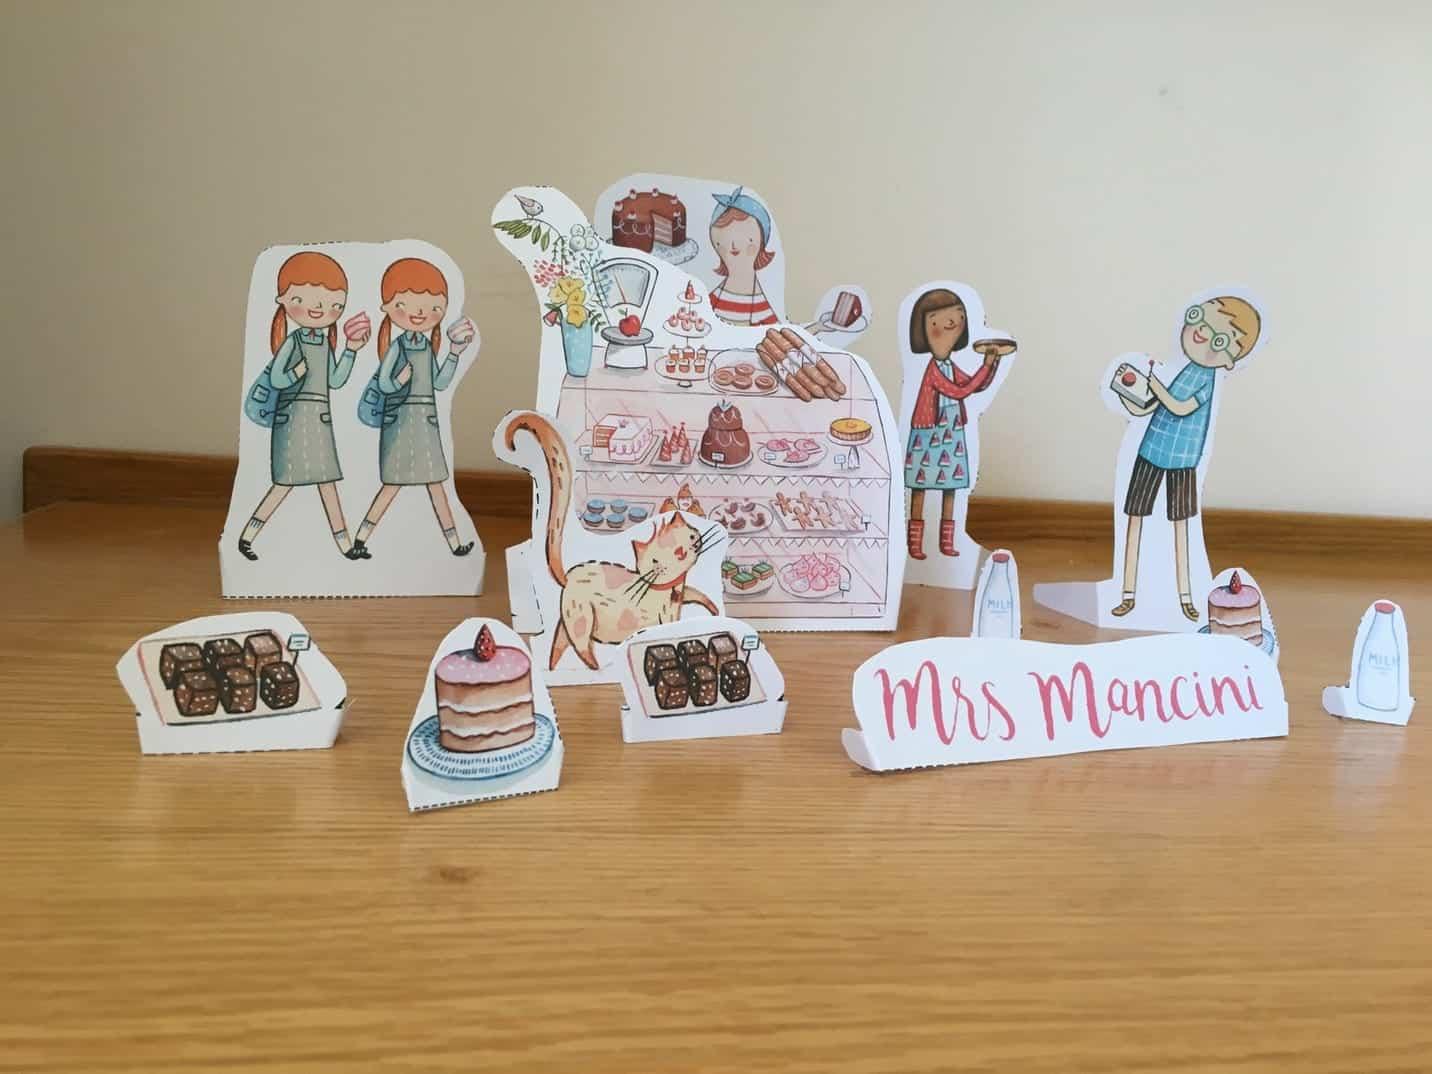 Image Credit: http://nataliejaneprior.com/makerspace-kids/